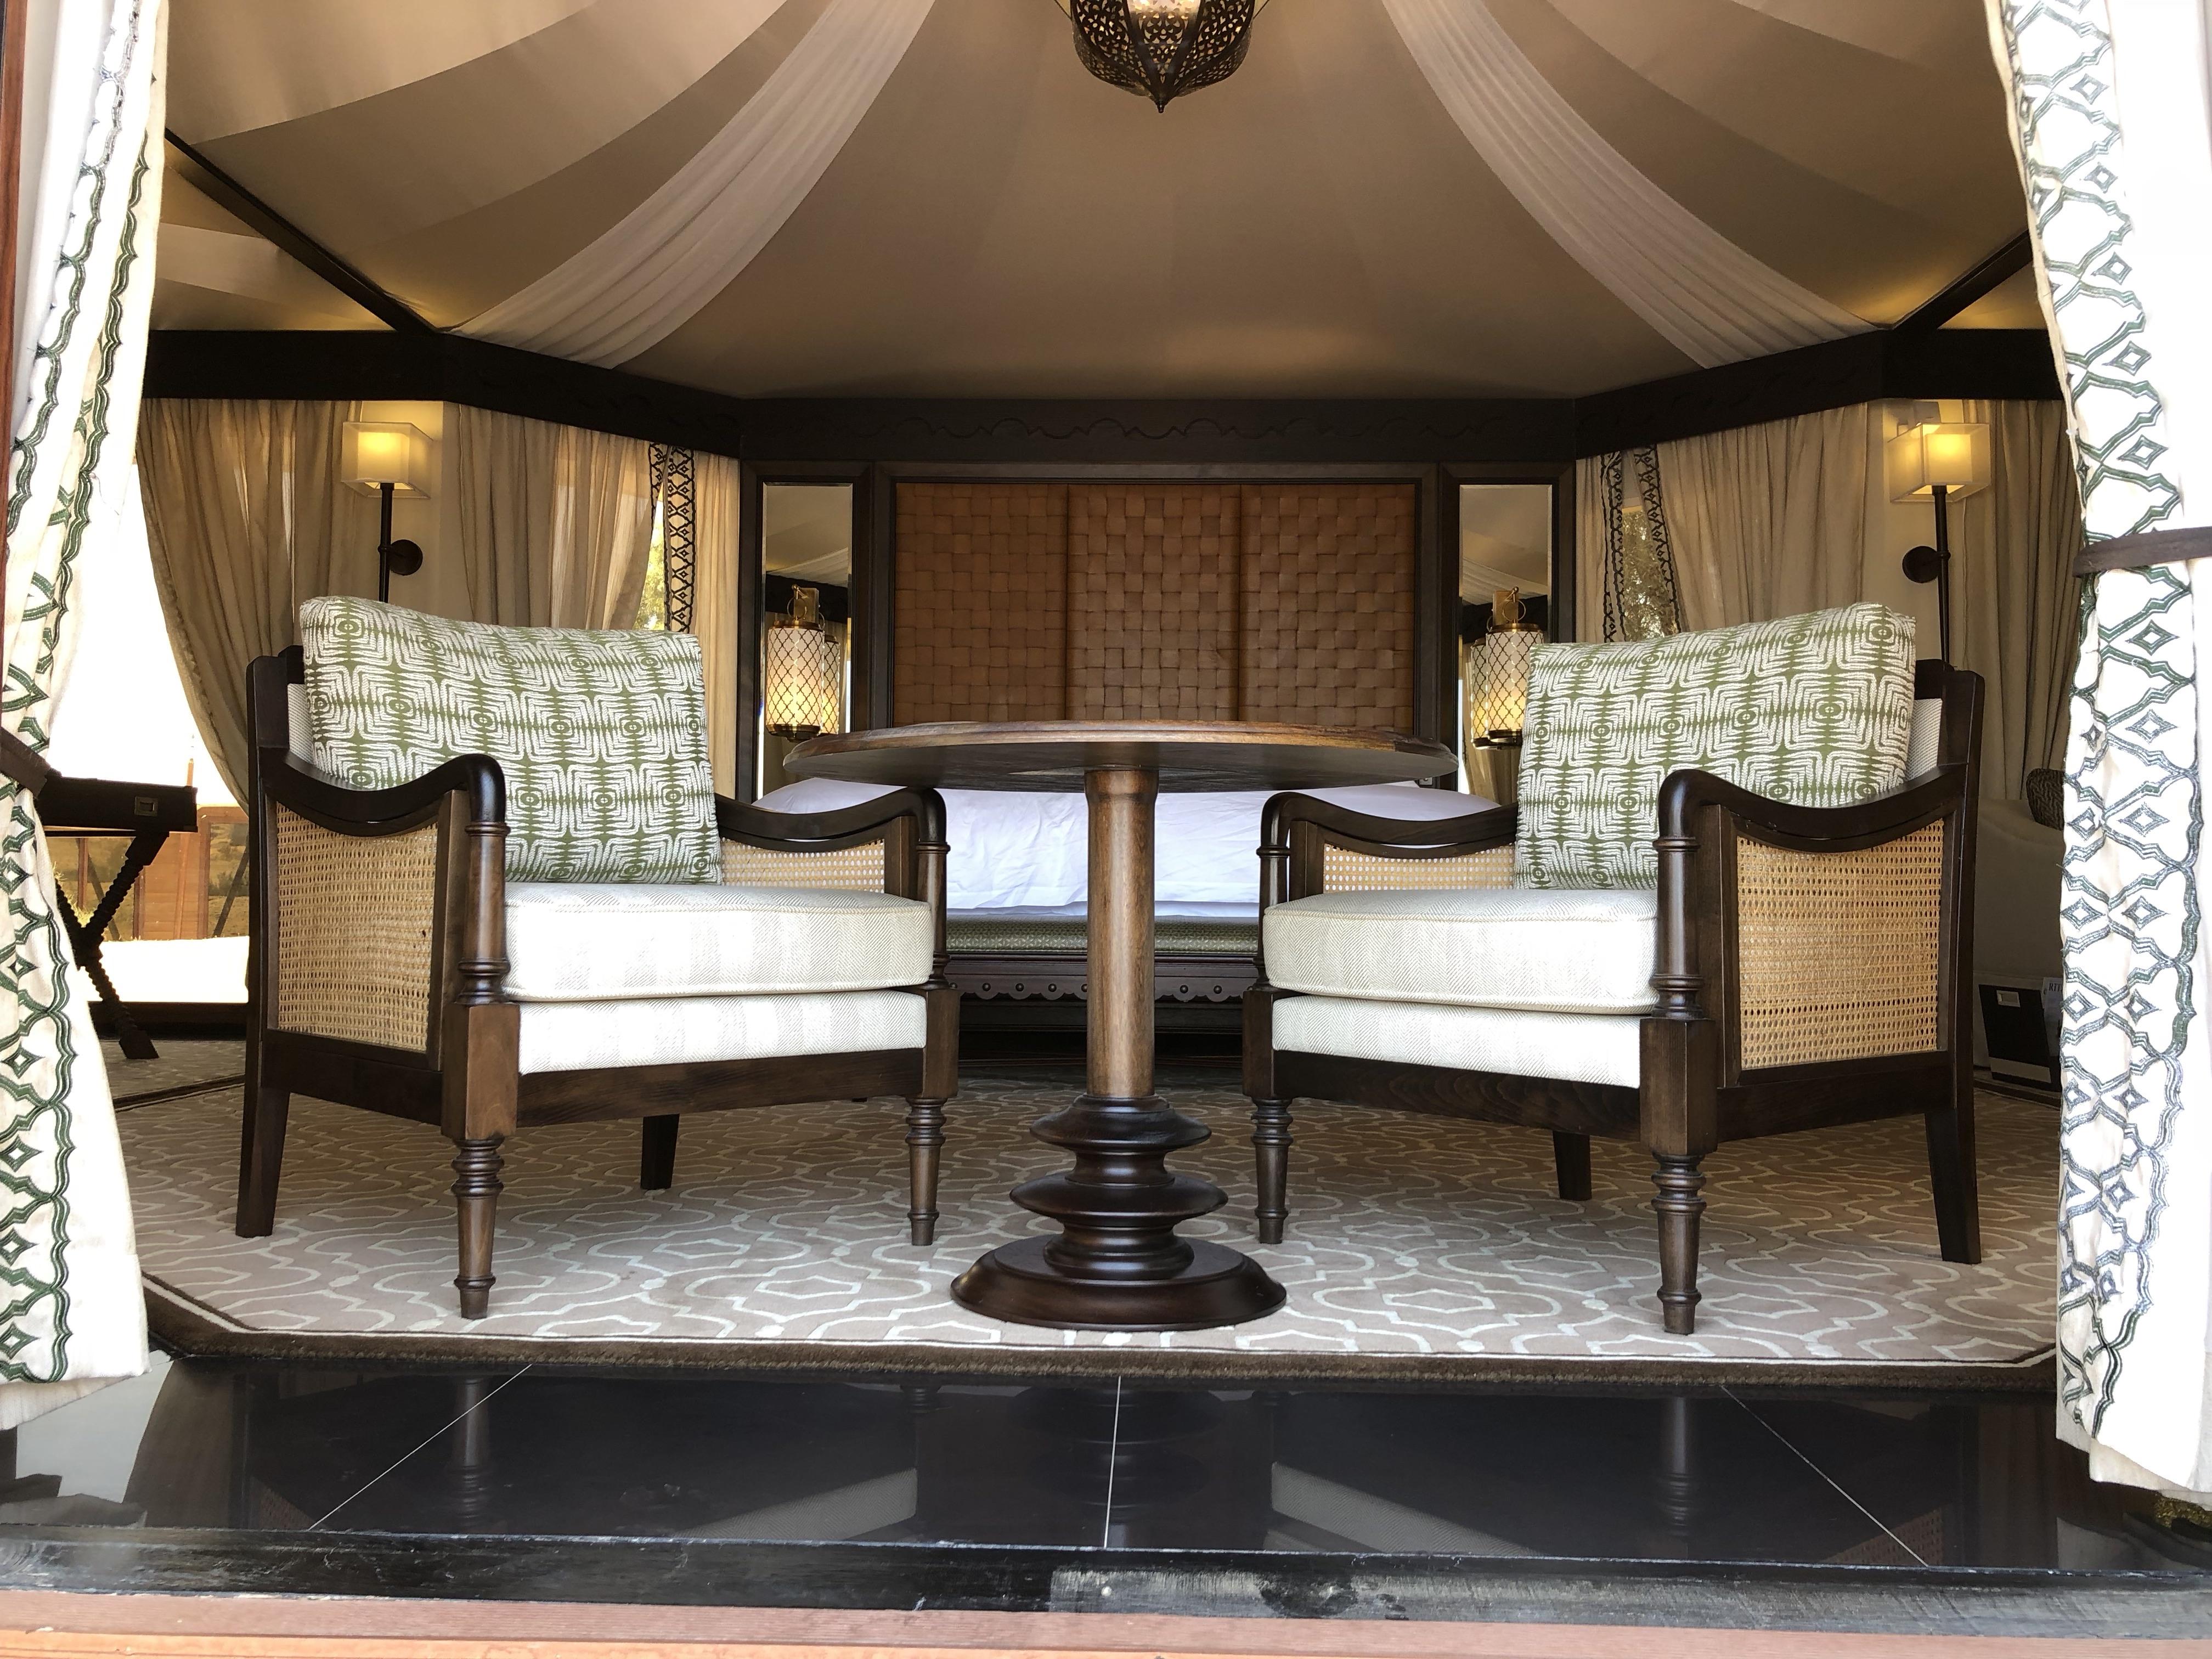 The Ritz Carlton, Ras Al Khaimah, Al wadai desert 48